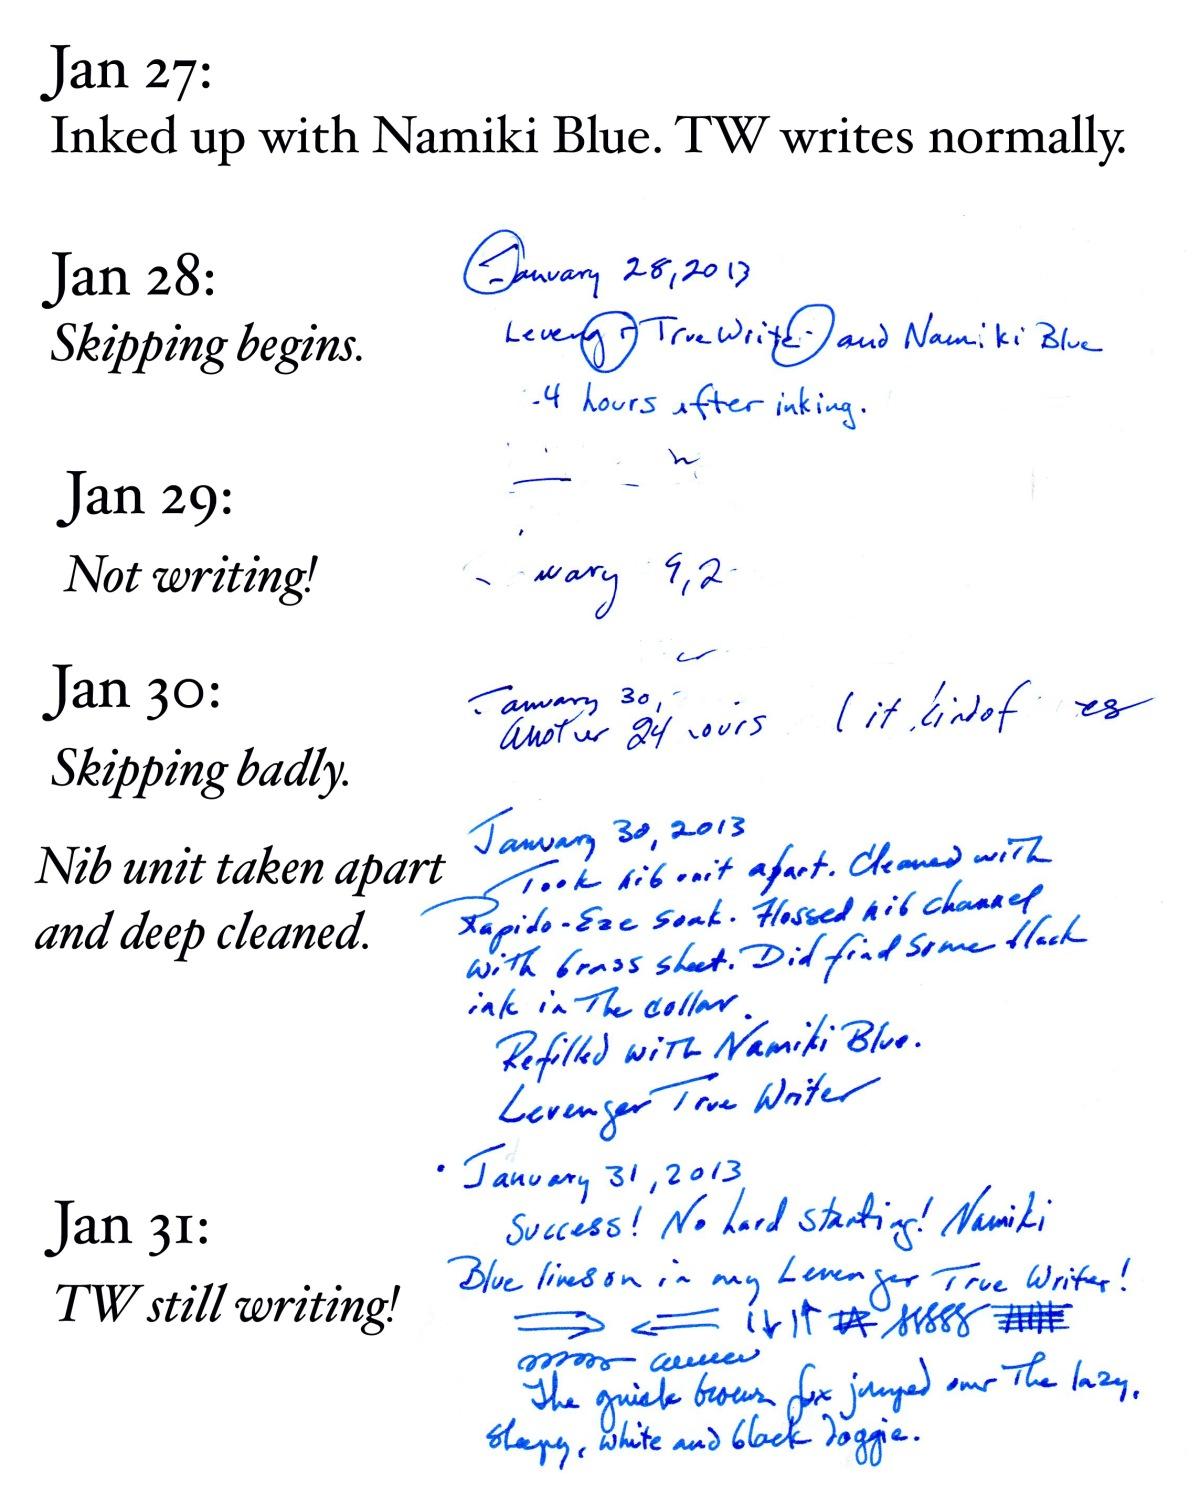 Namiki Blue, HP 32# Premium Laser Printer Paper, Levenger True Writer  diary excerpt